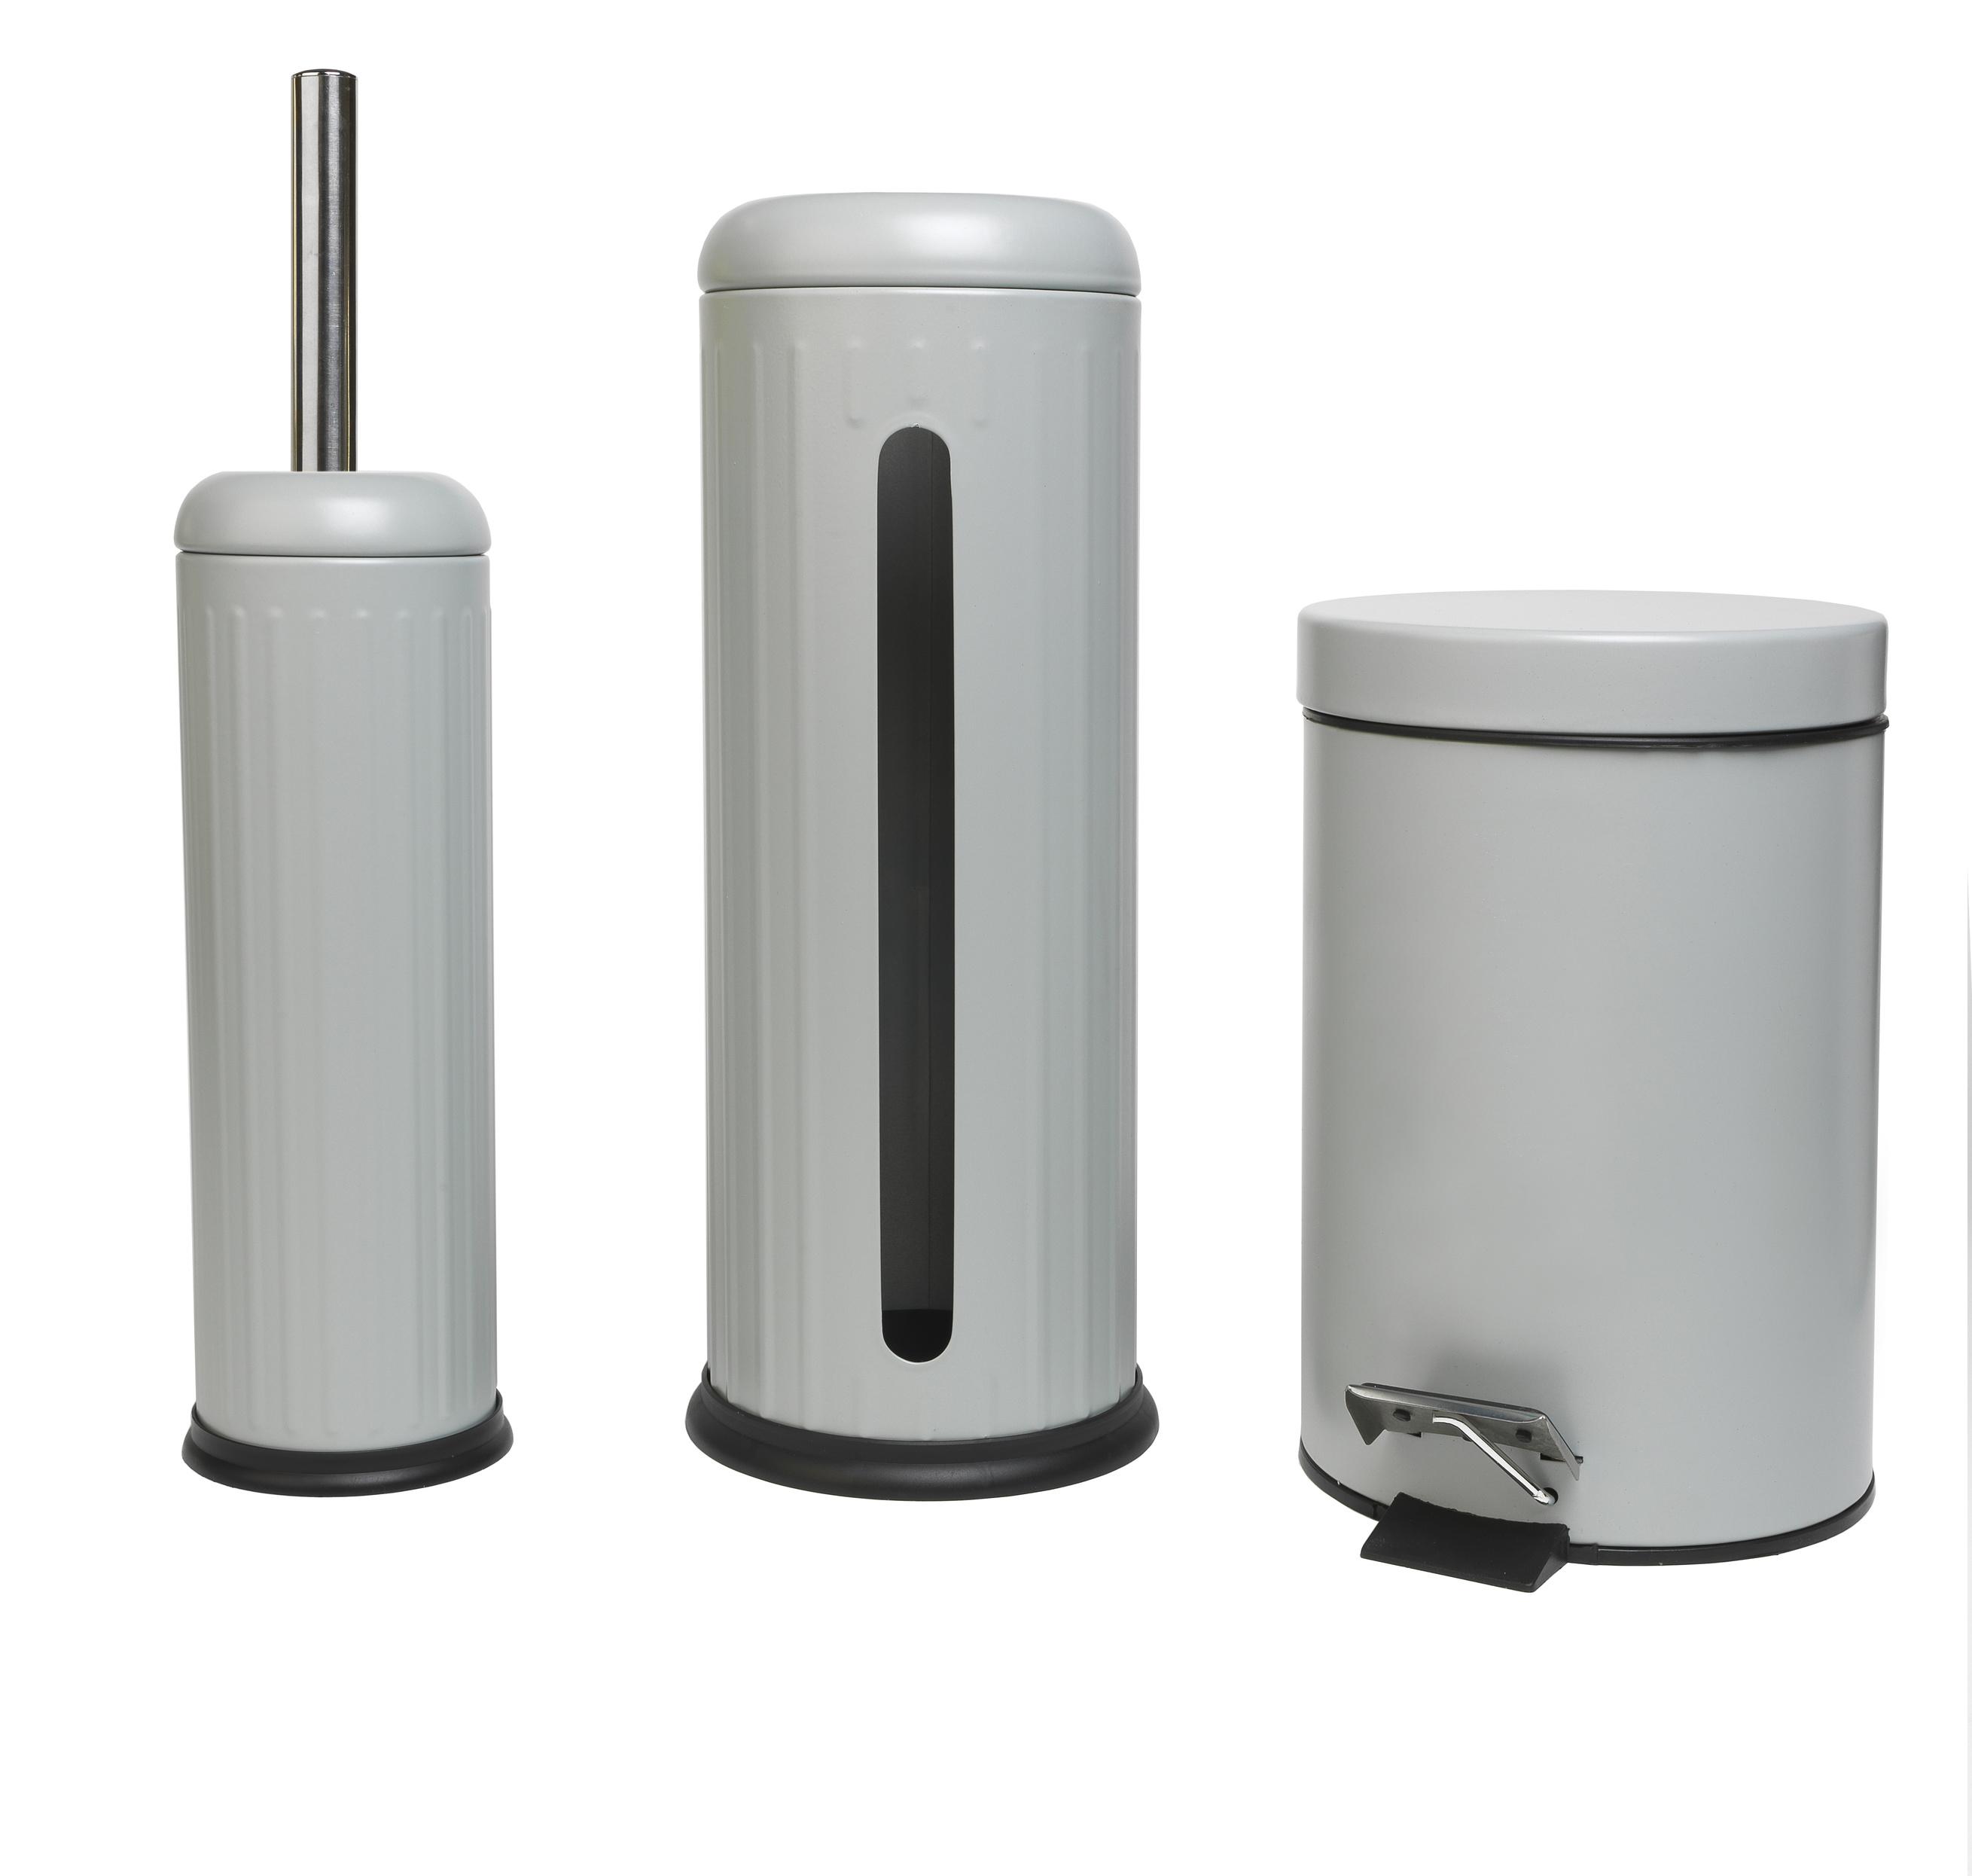 Beldray Combo 3324 Toilet Roll Storage